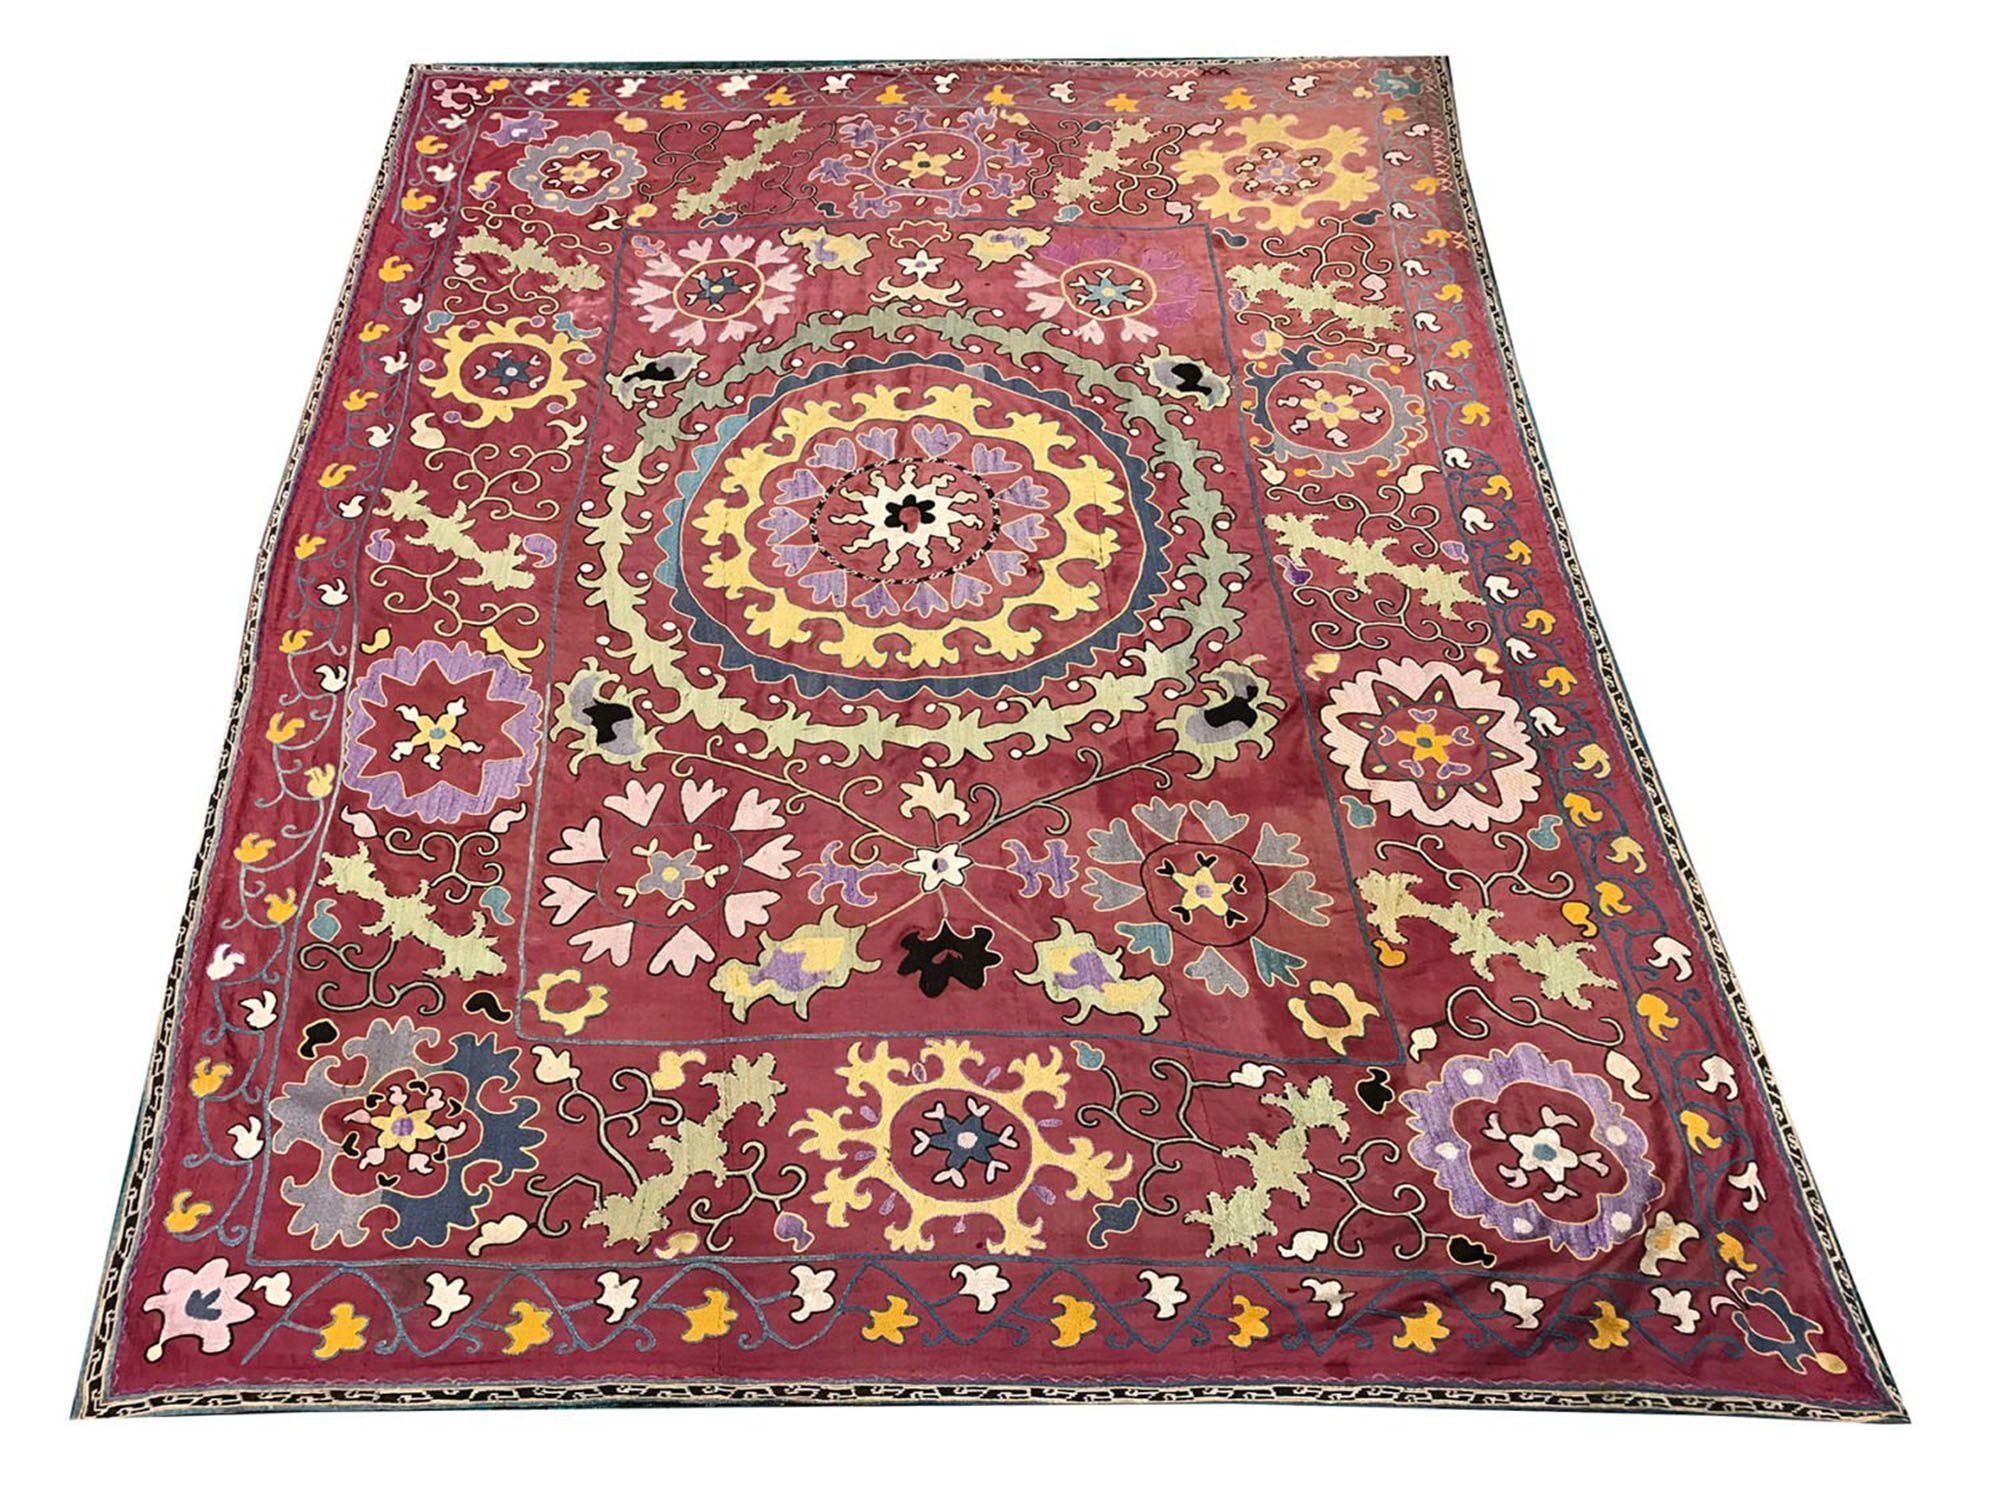 Antique Handmade Suzani Table Cover Suzani Fabric Suzani Handmade Bedspreads